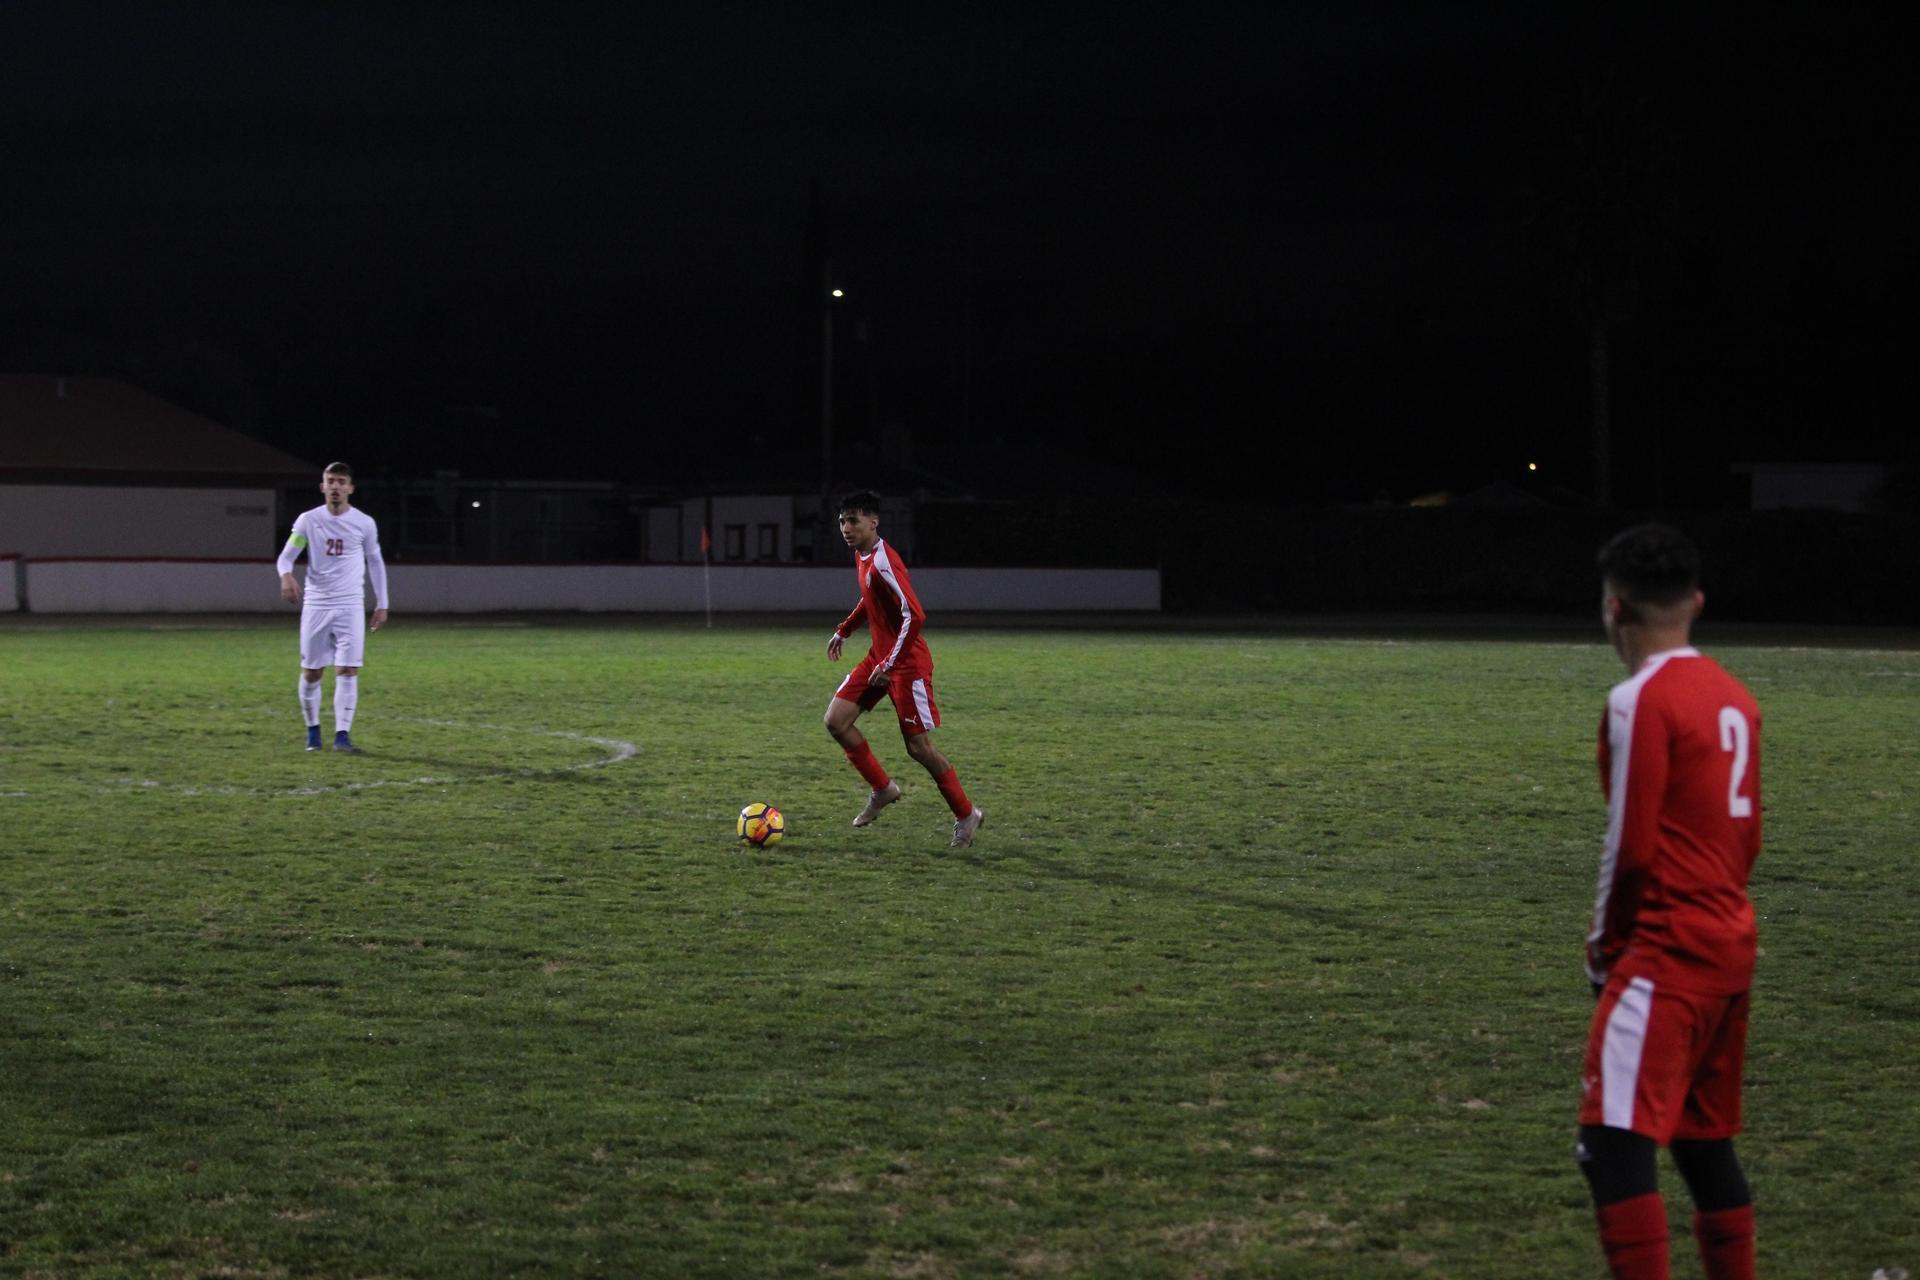 Boys Playing Soccer